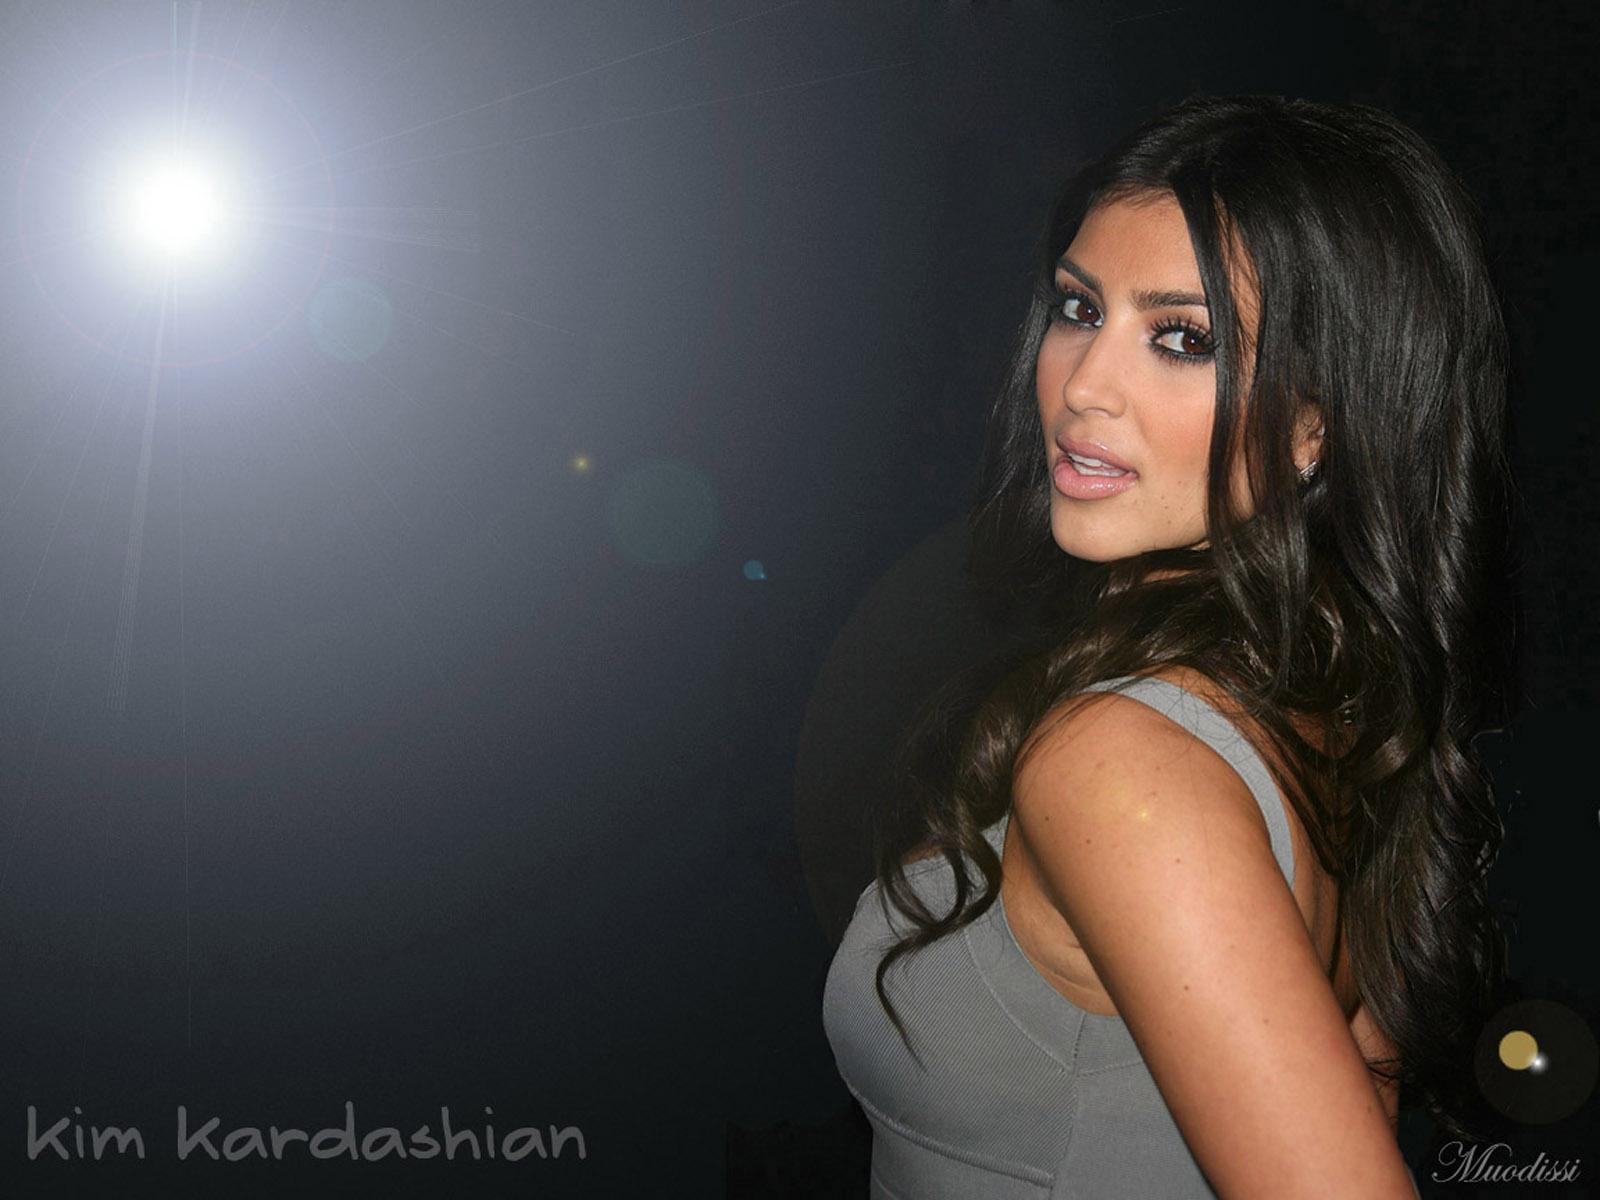 Latest Updates: Kim Kardashian Hot and sexy bikini HD Wallpapers